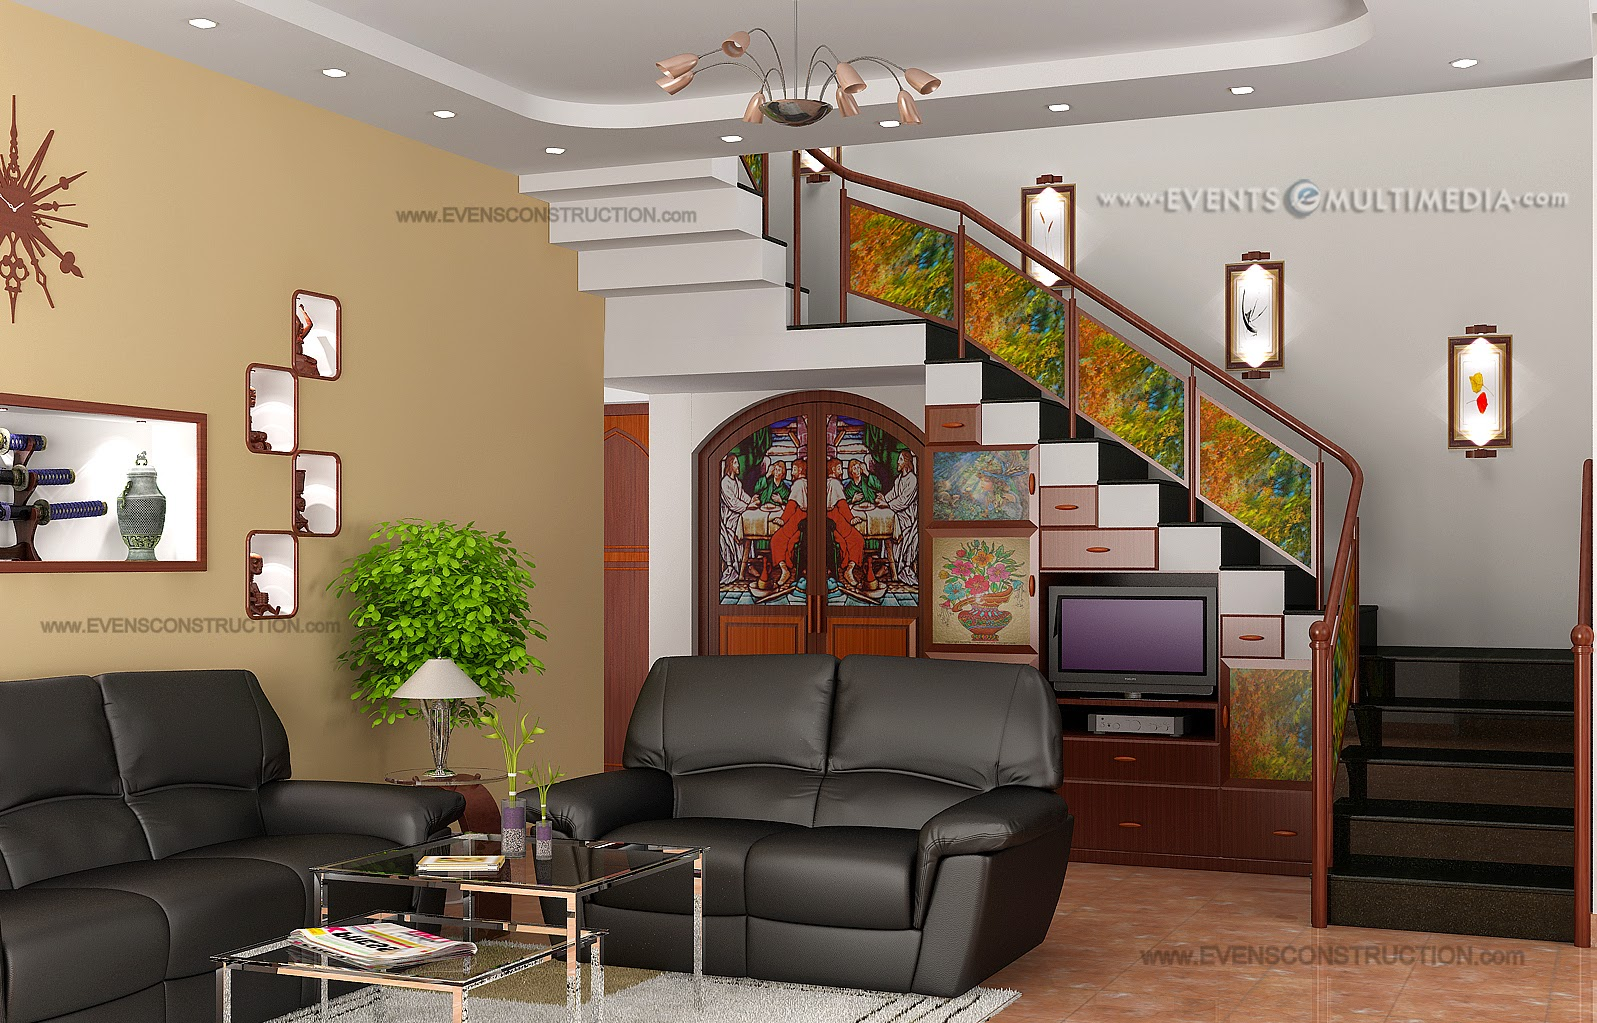 evens construction pvt ltd living room near stair area